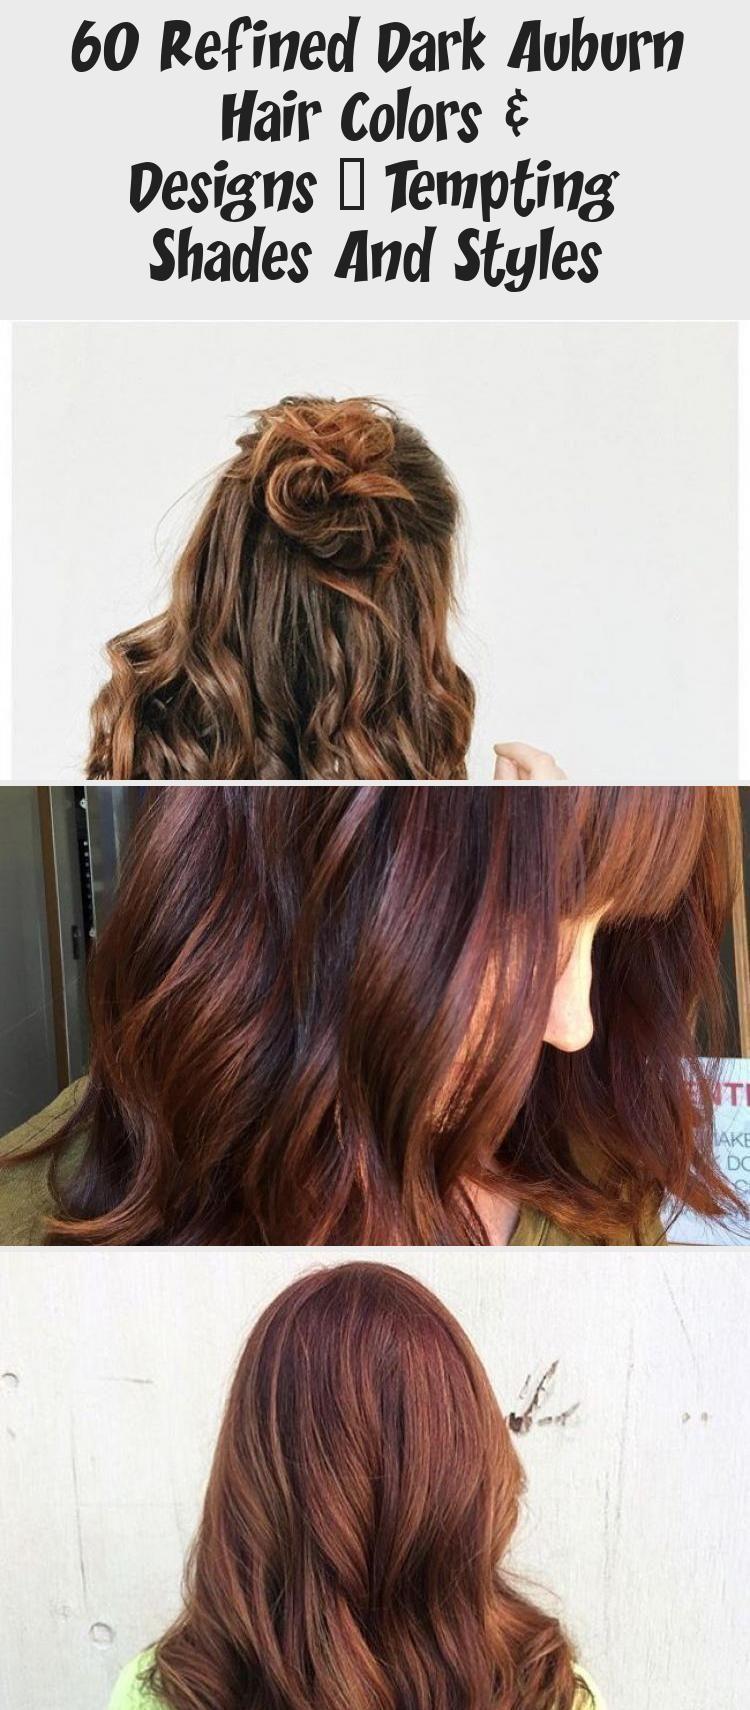 60 Refined Dark Auburn Hair Colors & Designs — Tempting Shades And Styles - Ha... -  60 Refined Dark Auburn Hair Colors & Designs — Tempting Shades And Styles – Ha… –     60 Re - #auburn #auburnhairstyles #colors #Dark #designs #diyhairstylesshorthair #hair #hairstylesformen #refined #shades #styles #tempting